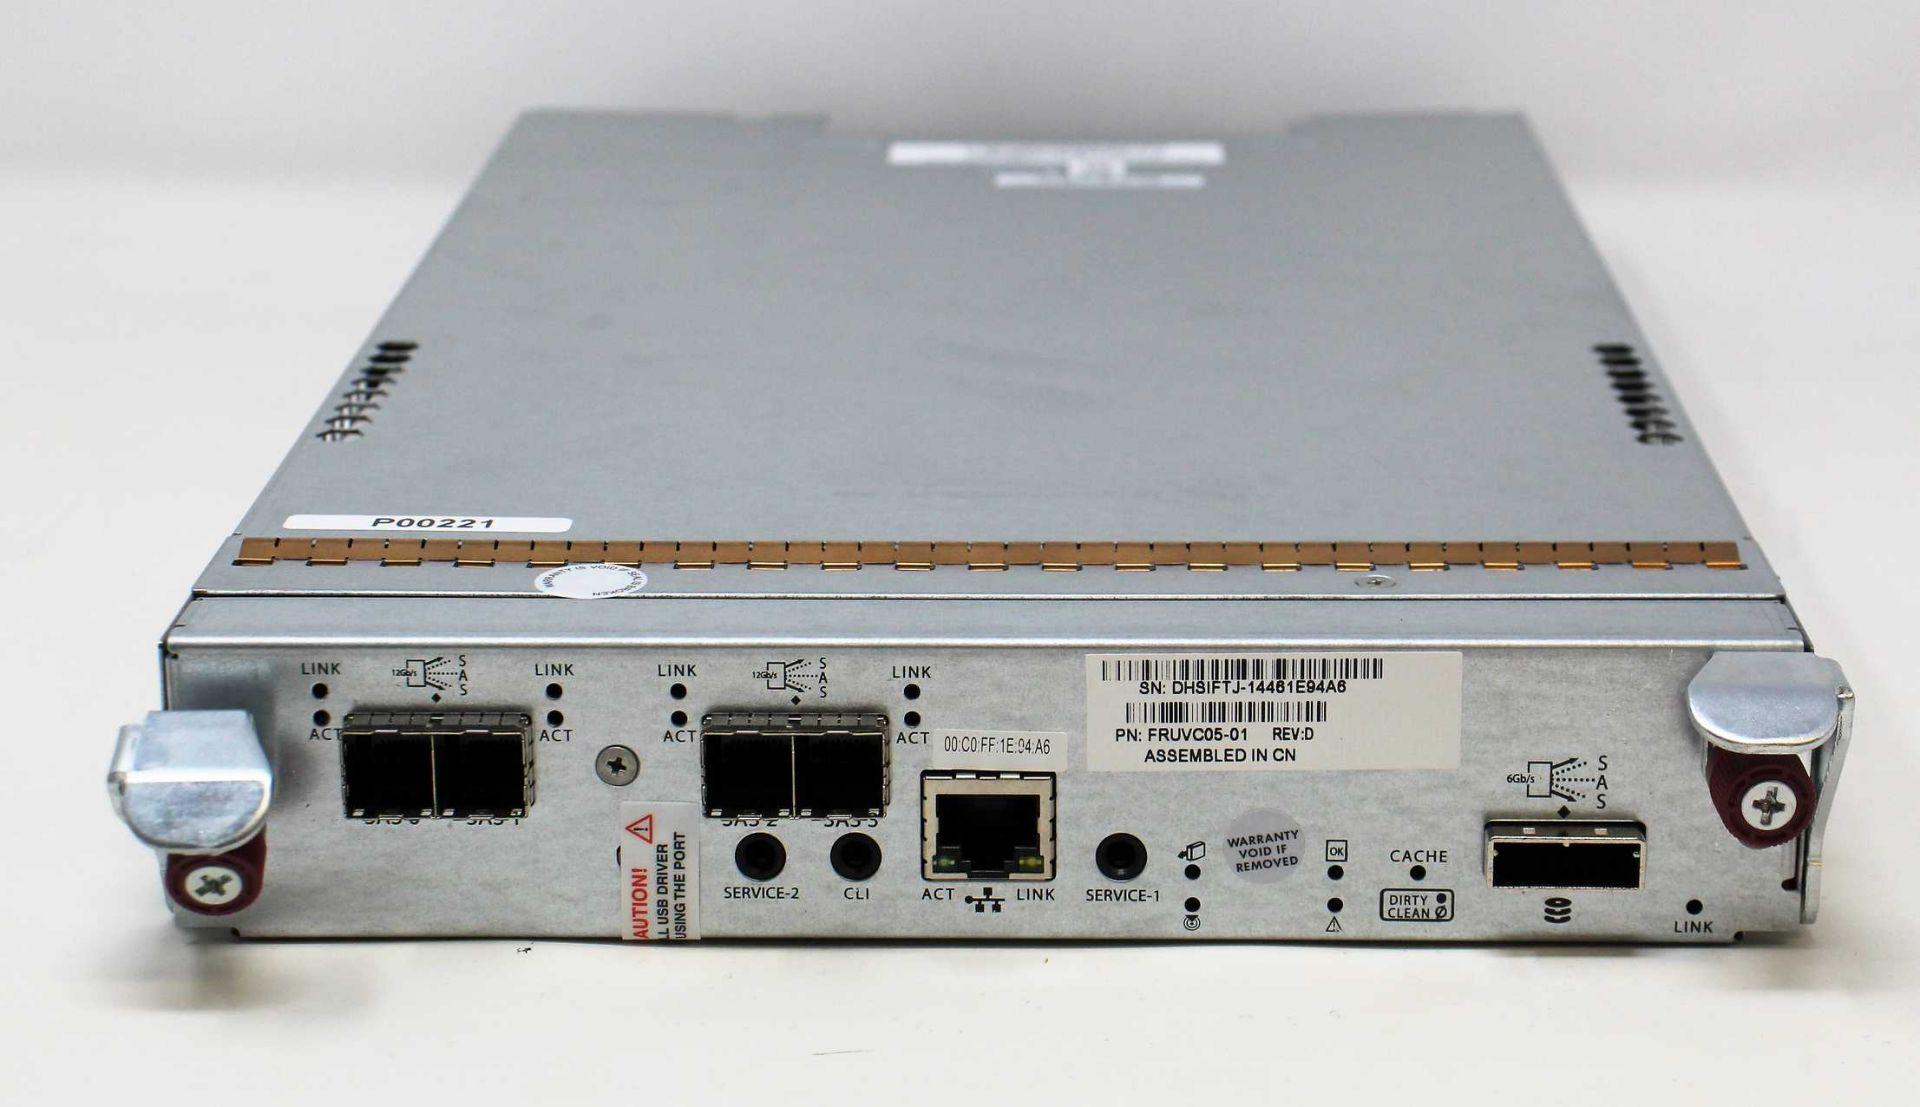 A pre-owned Gallium LX RAID Controller 45X4,4-12GSAS,1RM-LX,4GB,FRU,PKG,TD (P/N:PFRUVC05-01) (